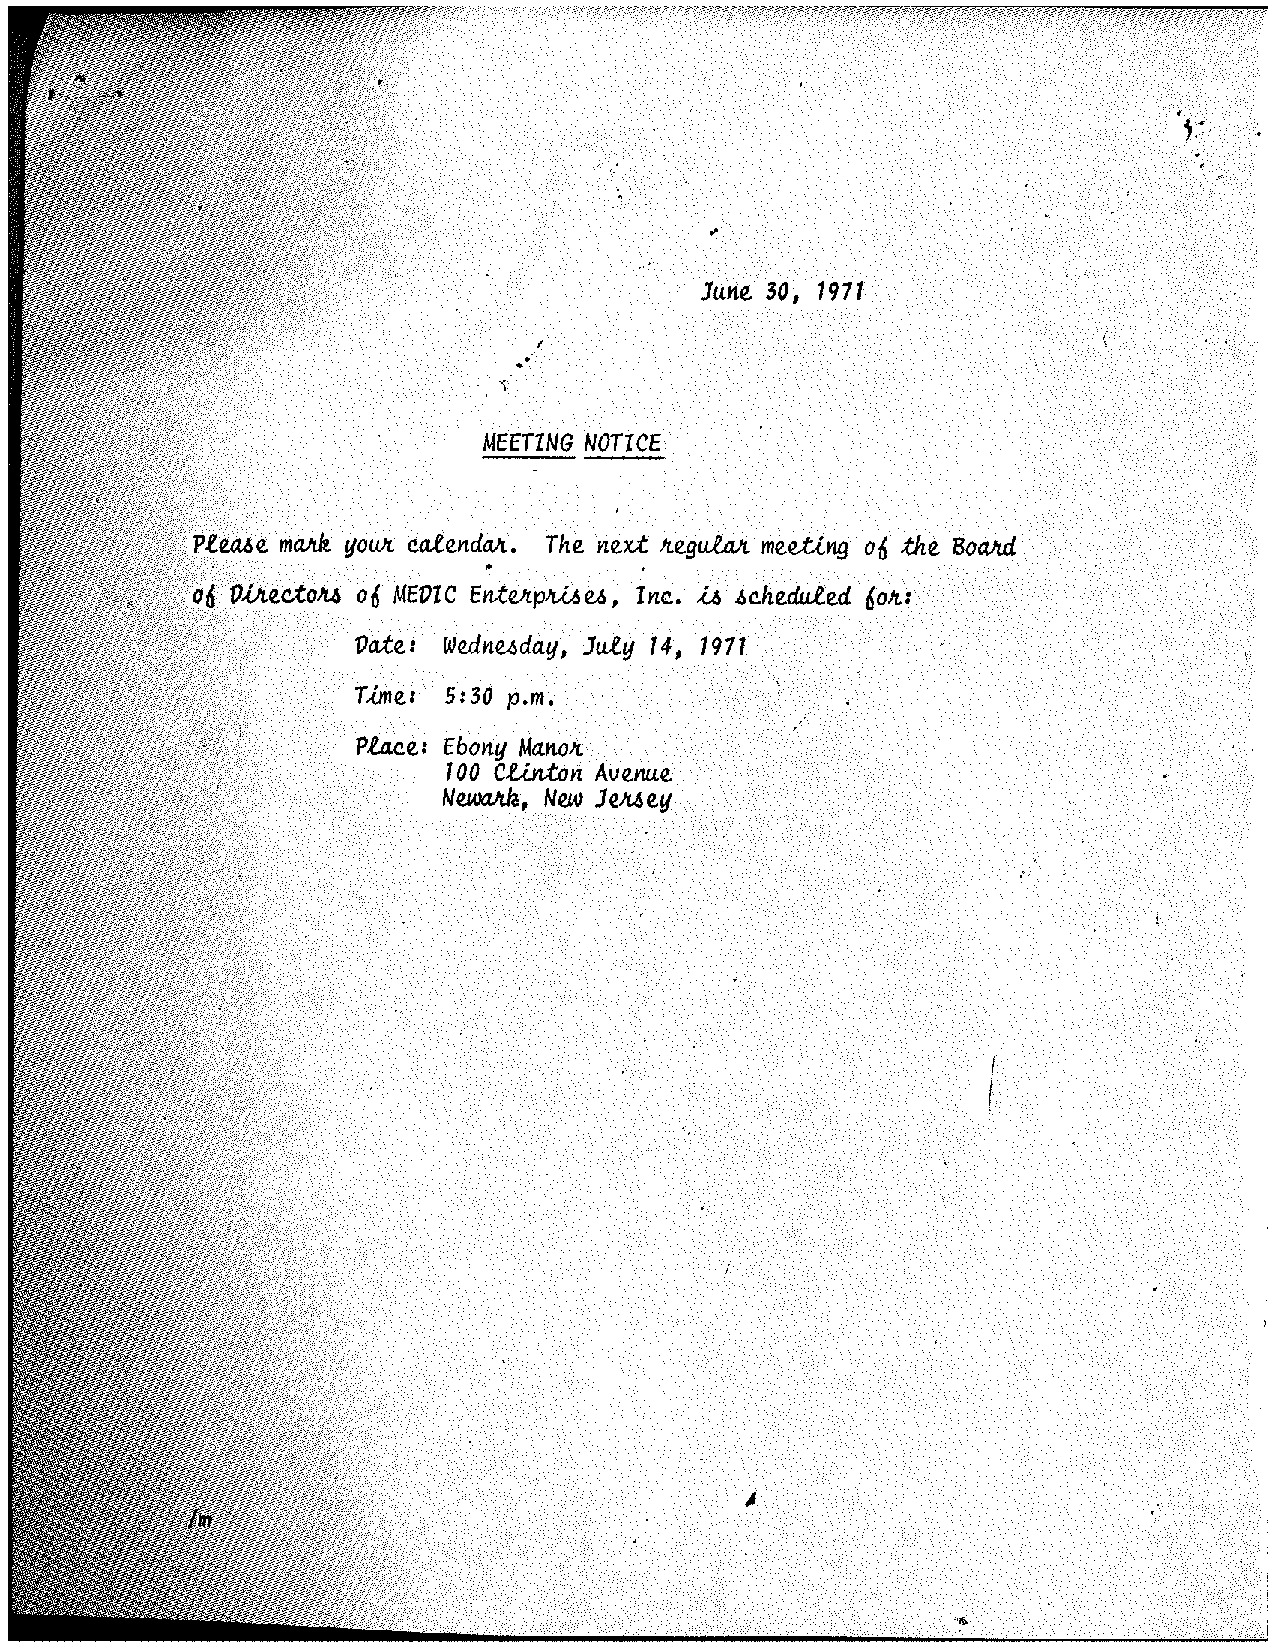 MEDIC Board Meeting Minutes (June 1971)